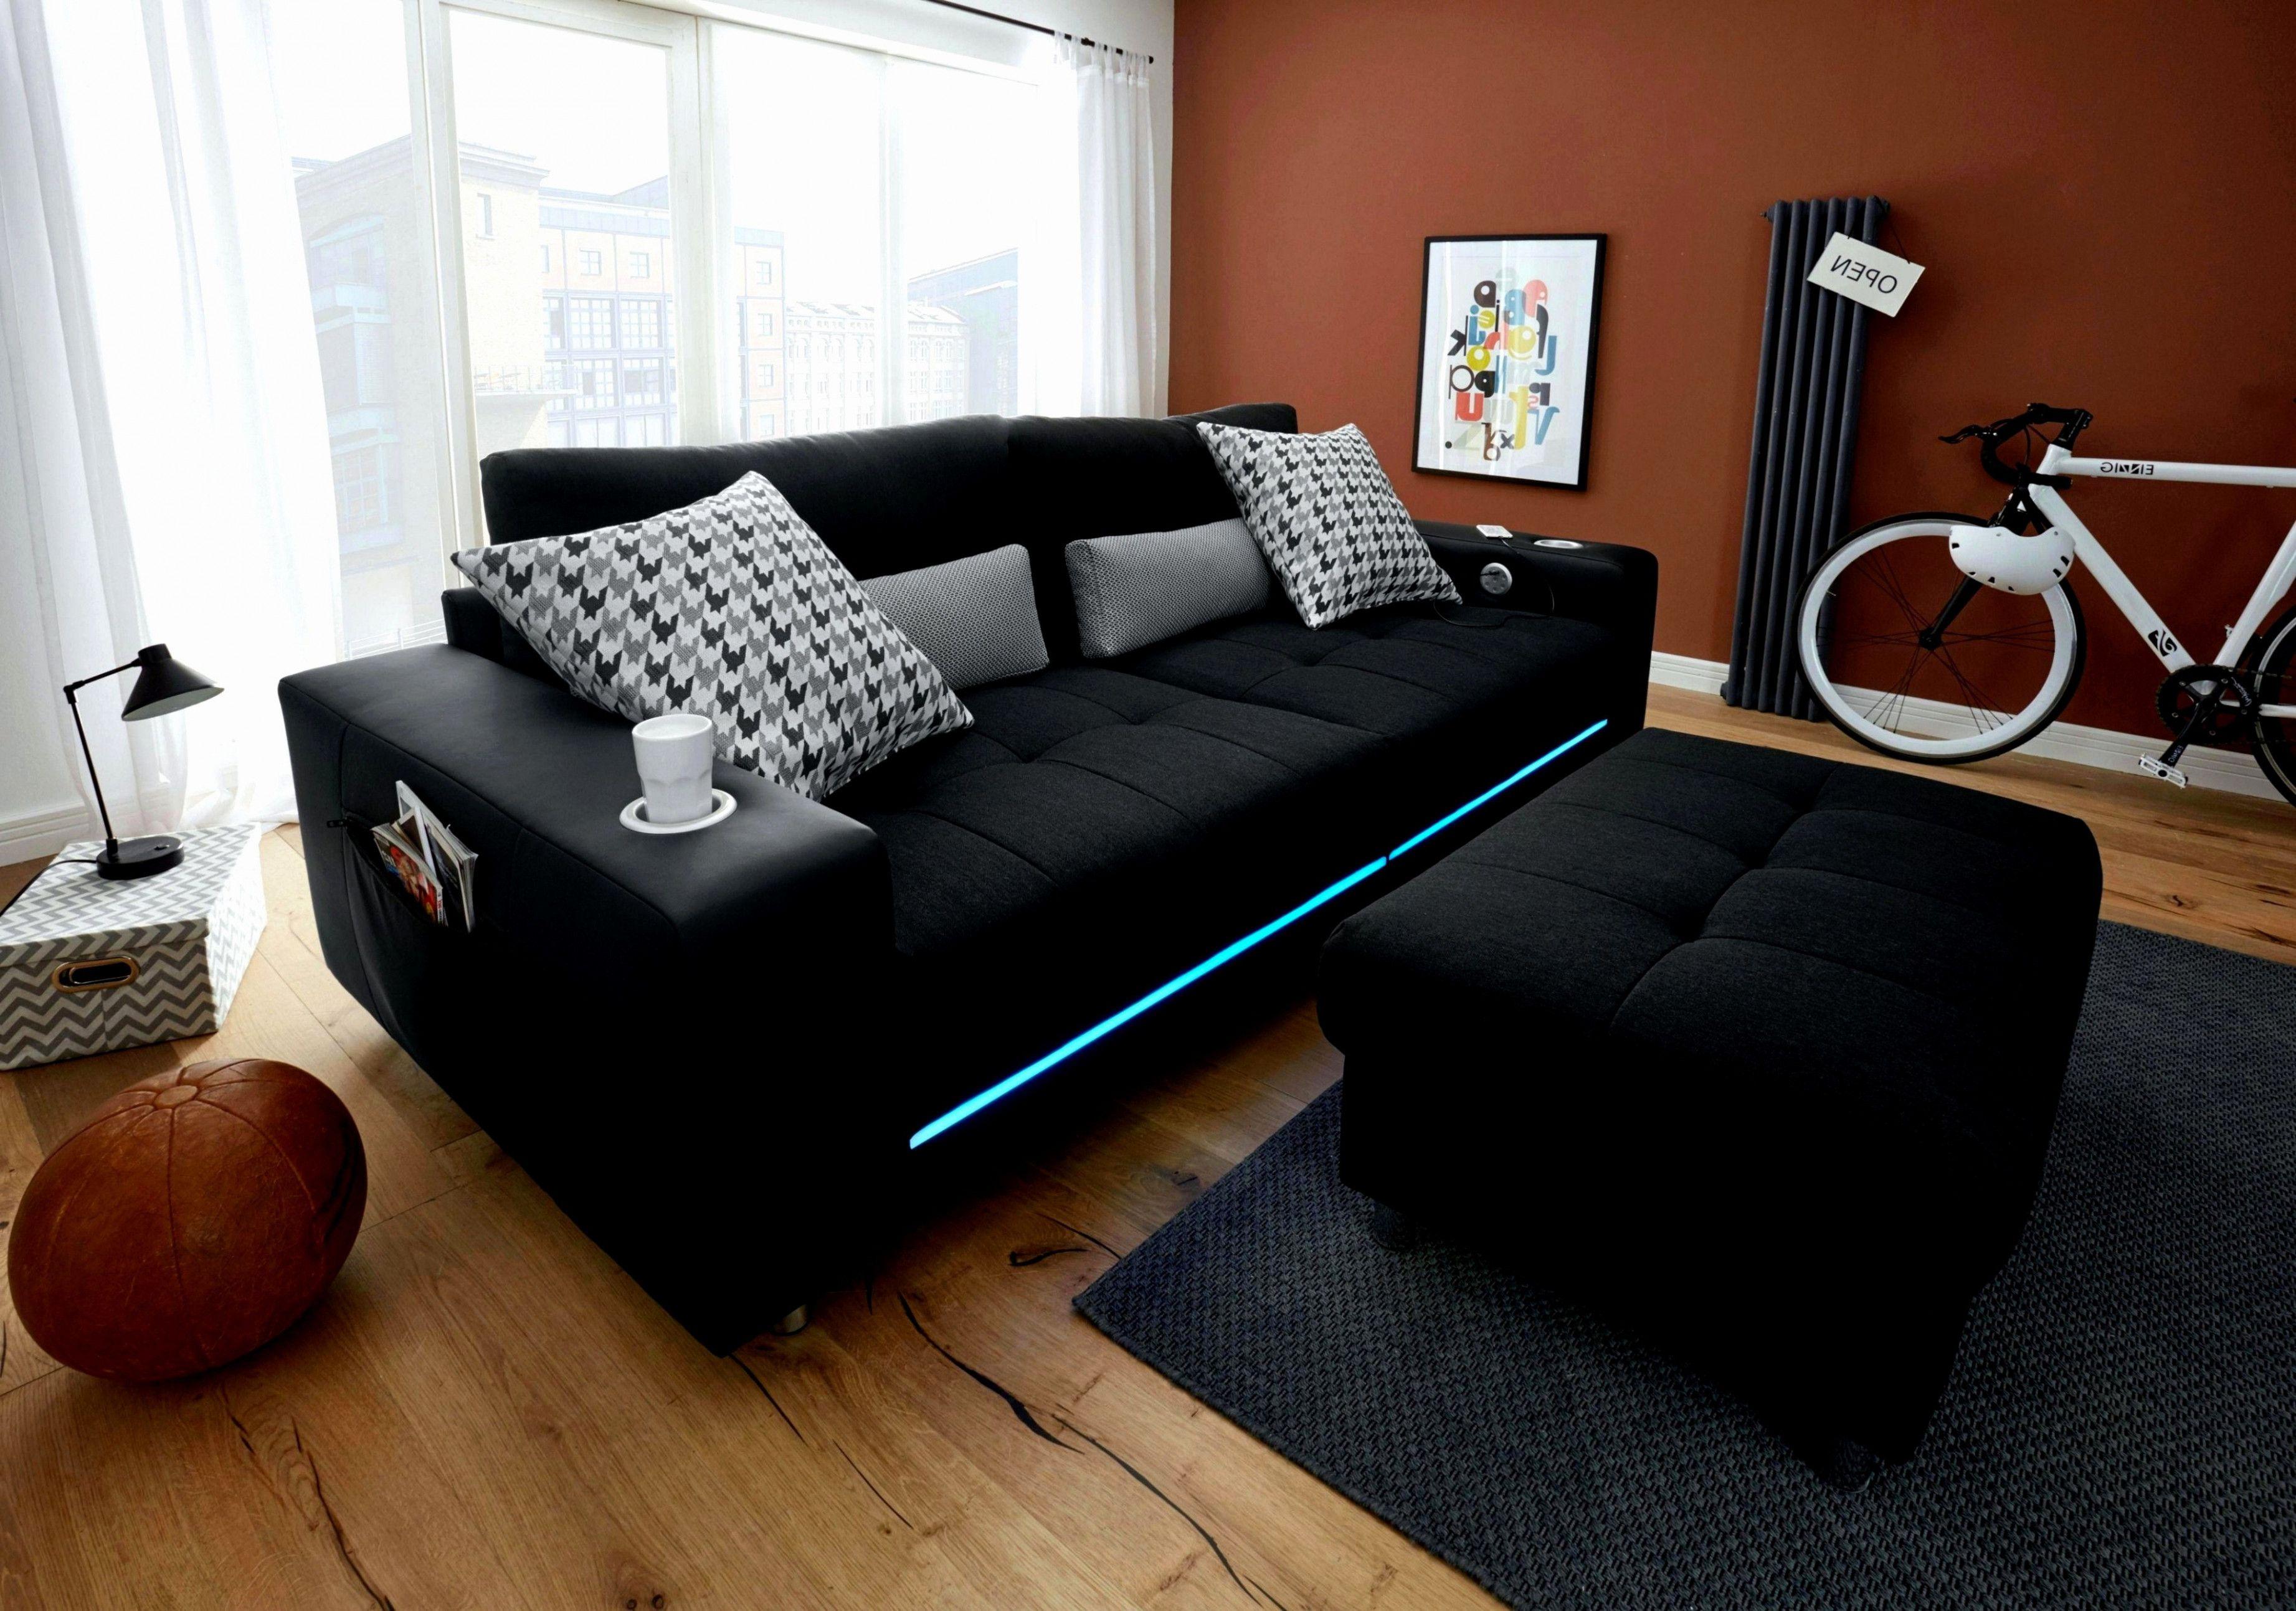 wohnzimmer möbel ebay berlin (dengan gambar)